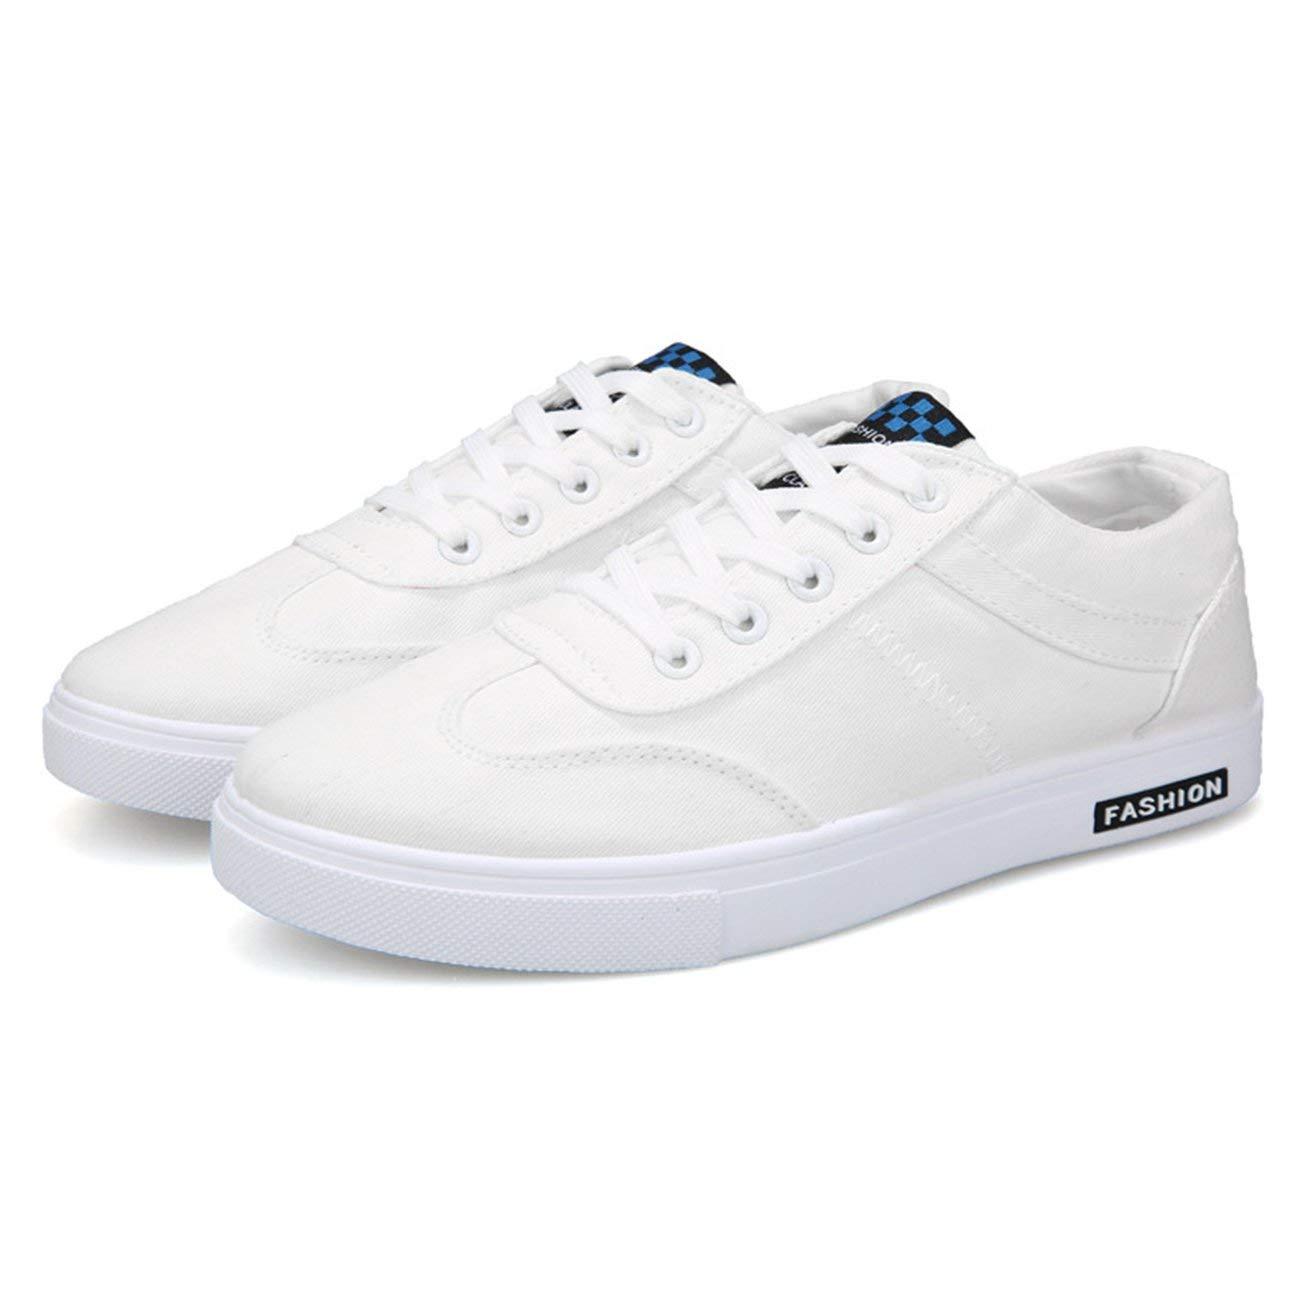 Printemps Automne Hommes Chaussures Mode Tendance Chaussures Casual Chaussures de Toile Respirante Jiobapiongxin